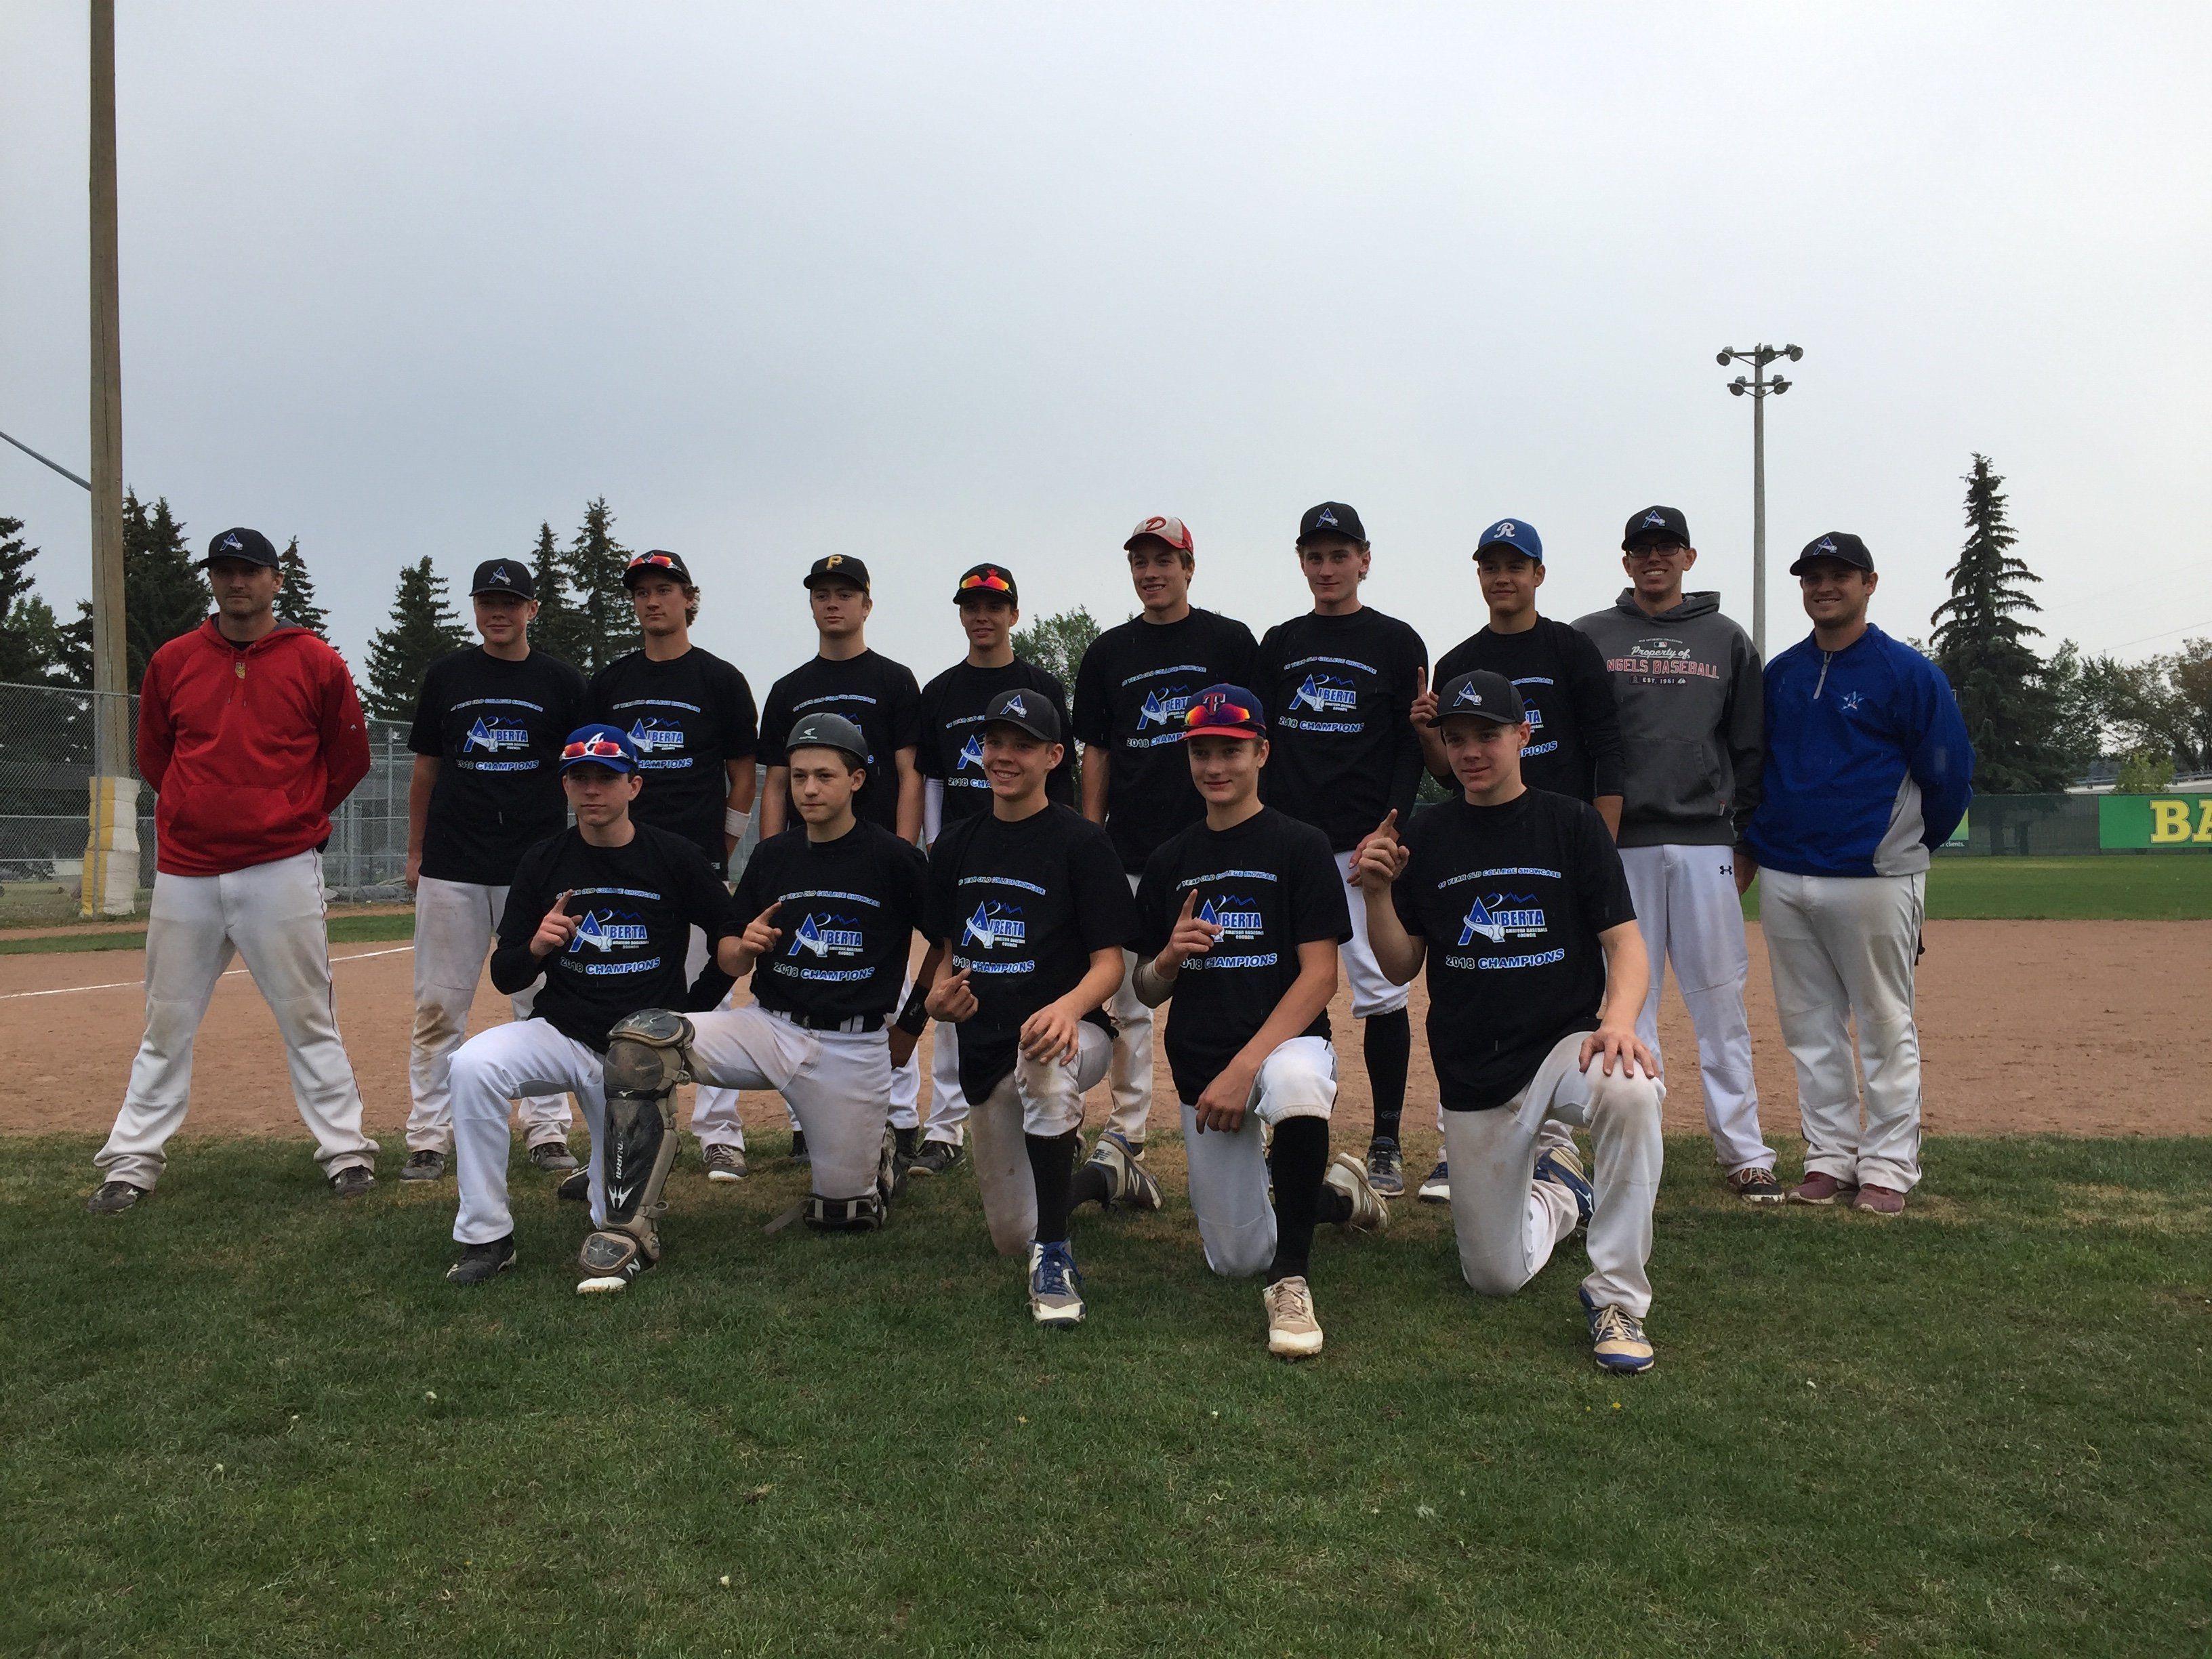 Alberta amateur baseball